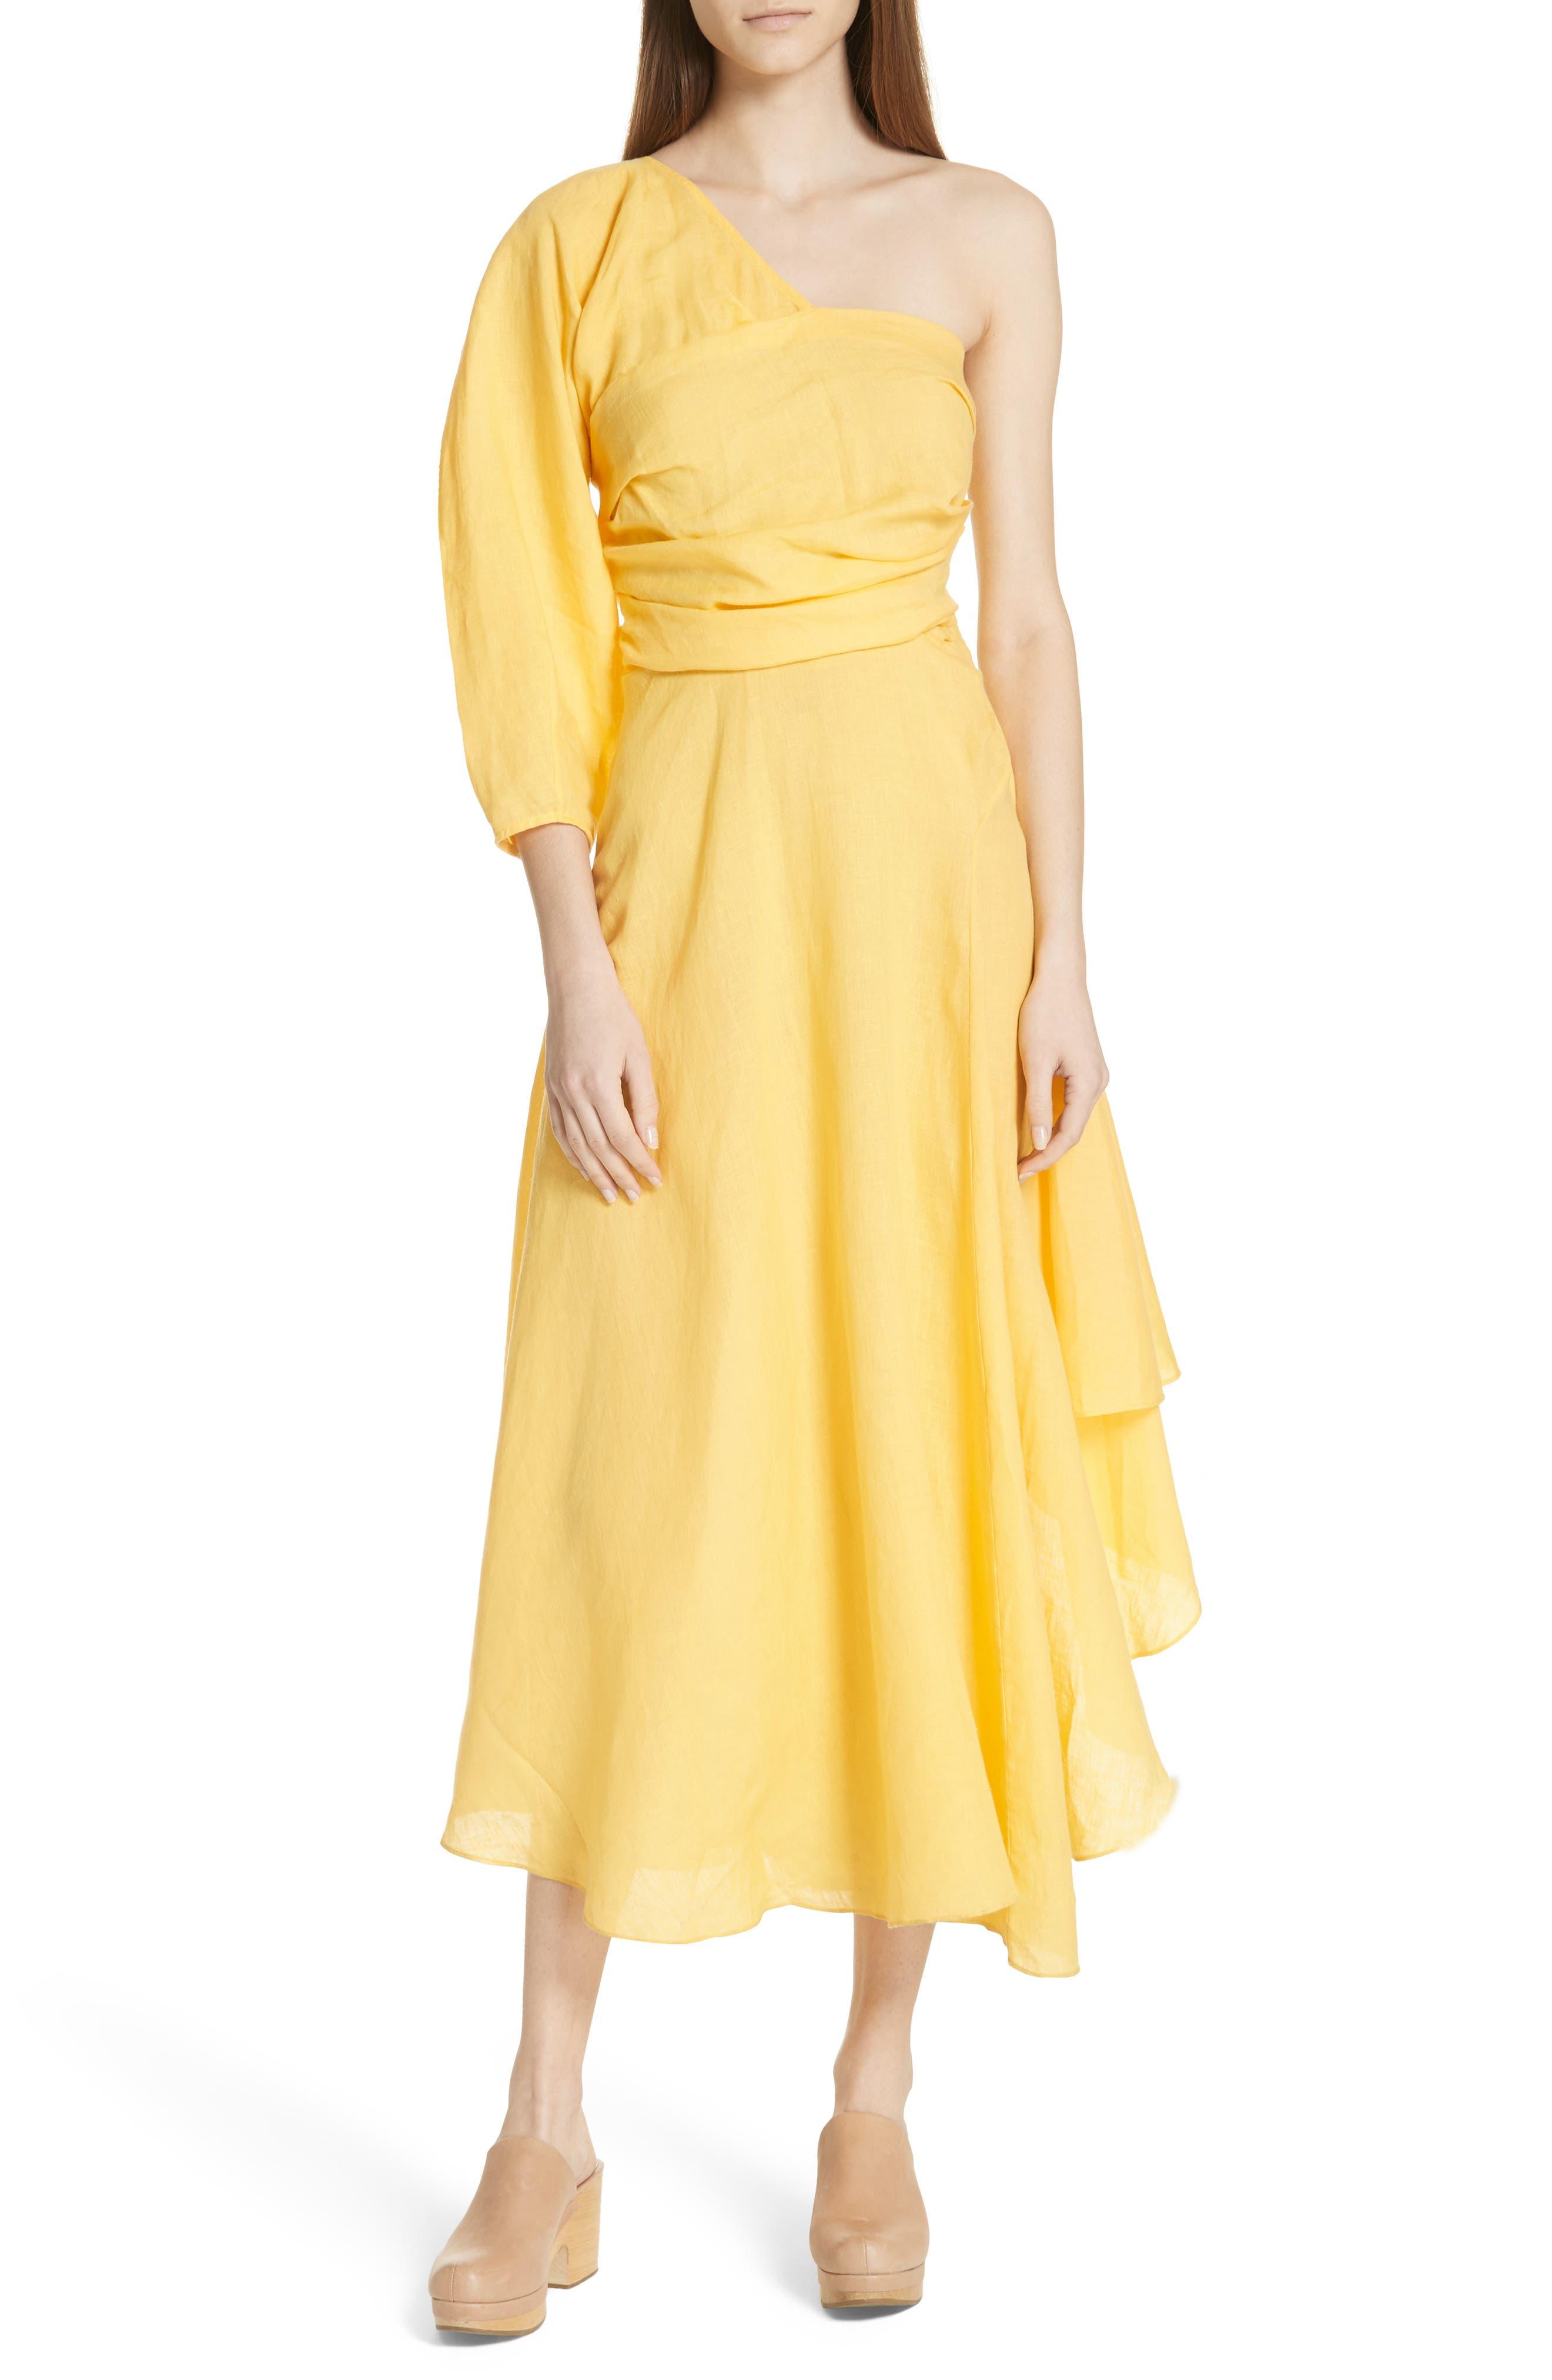 Tipple One-Shoulder Dress,                             Main thumbnail 1, color,                             YELLOW